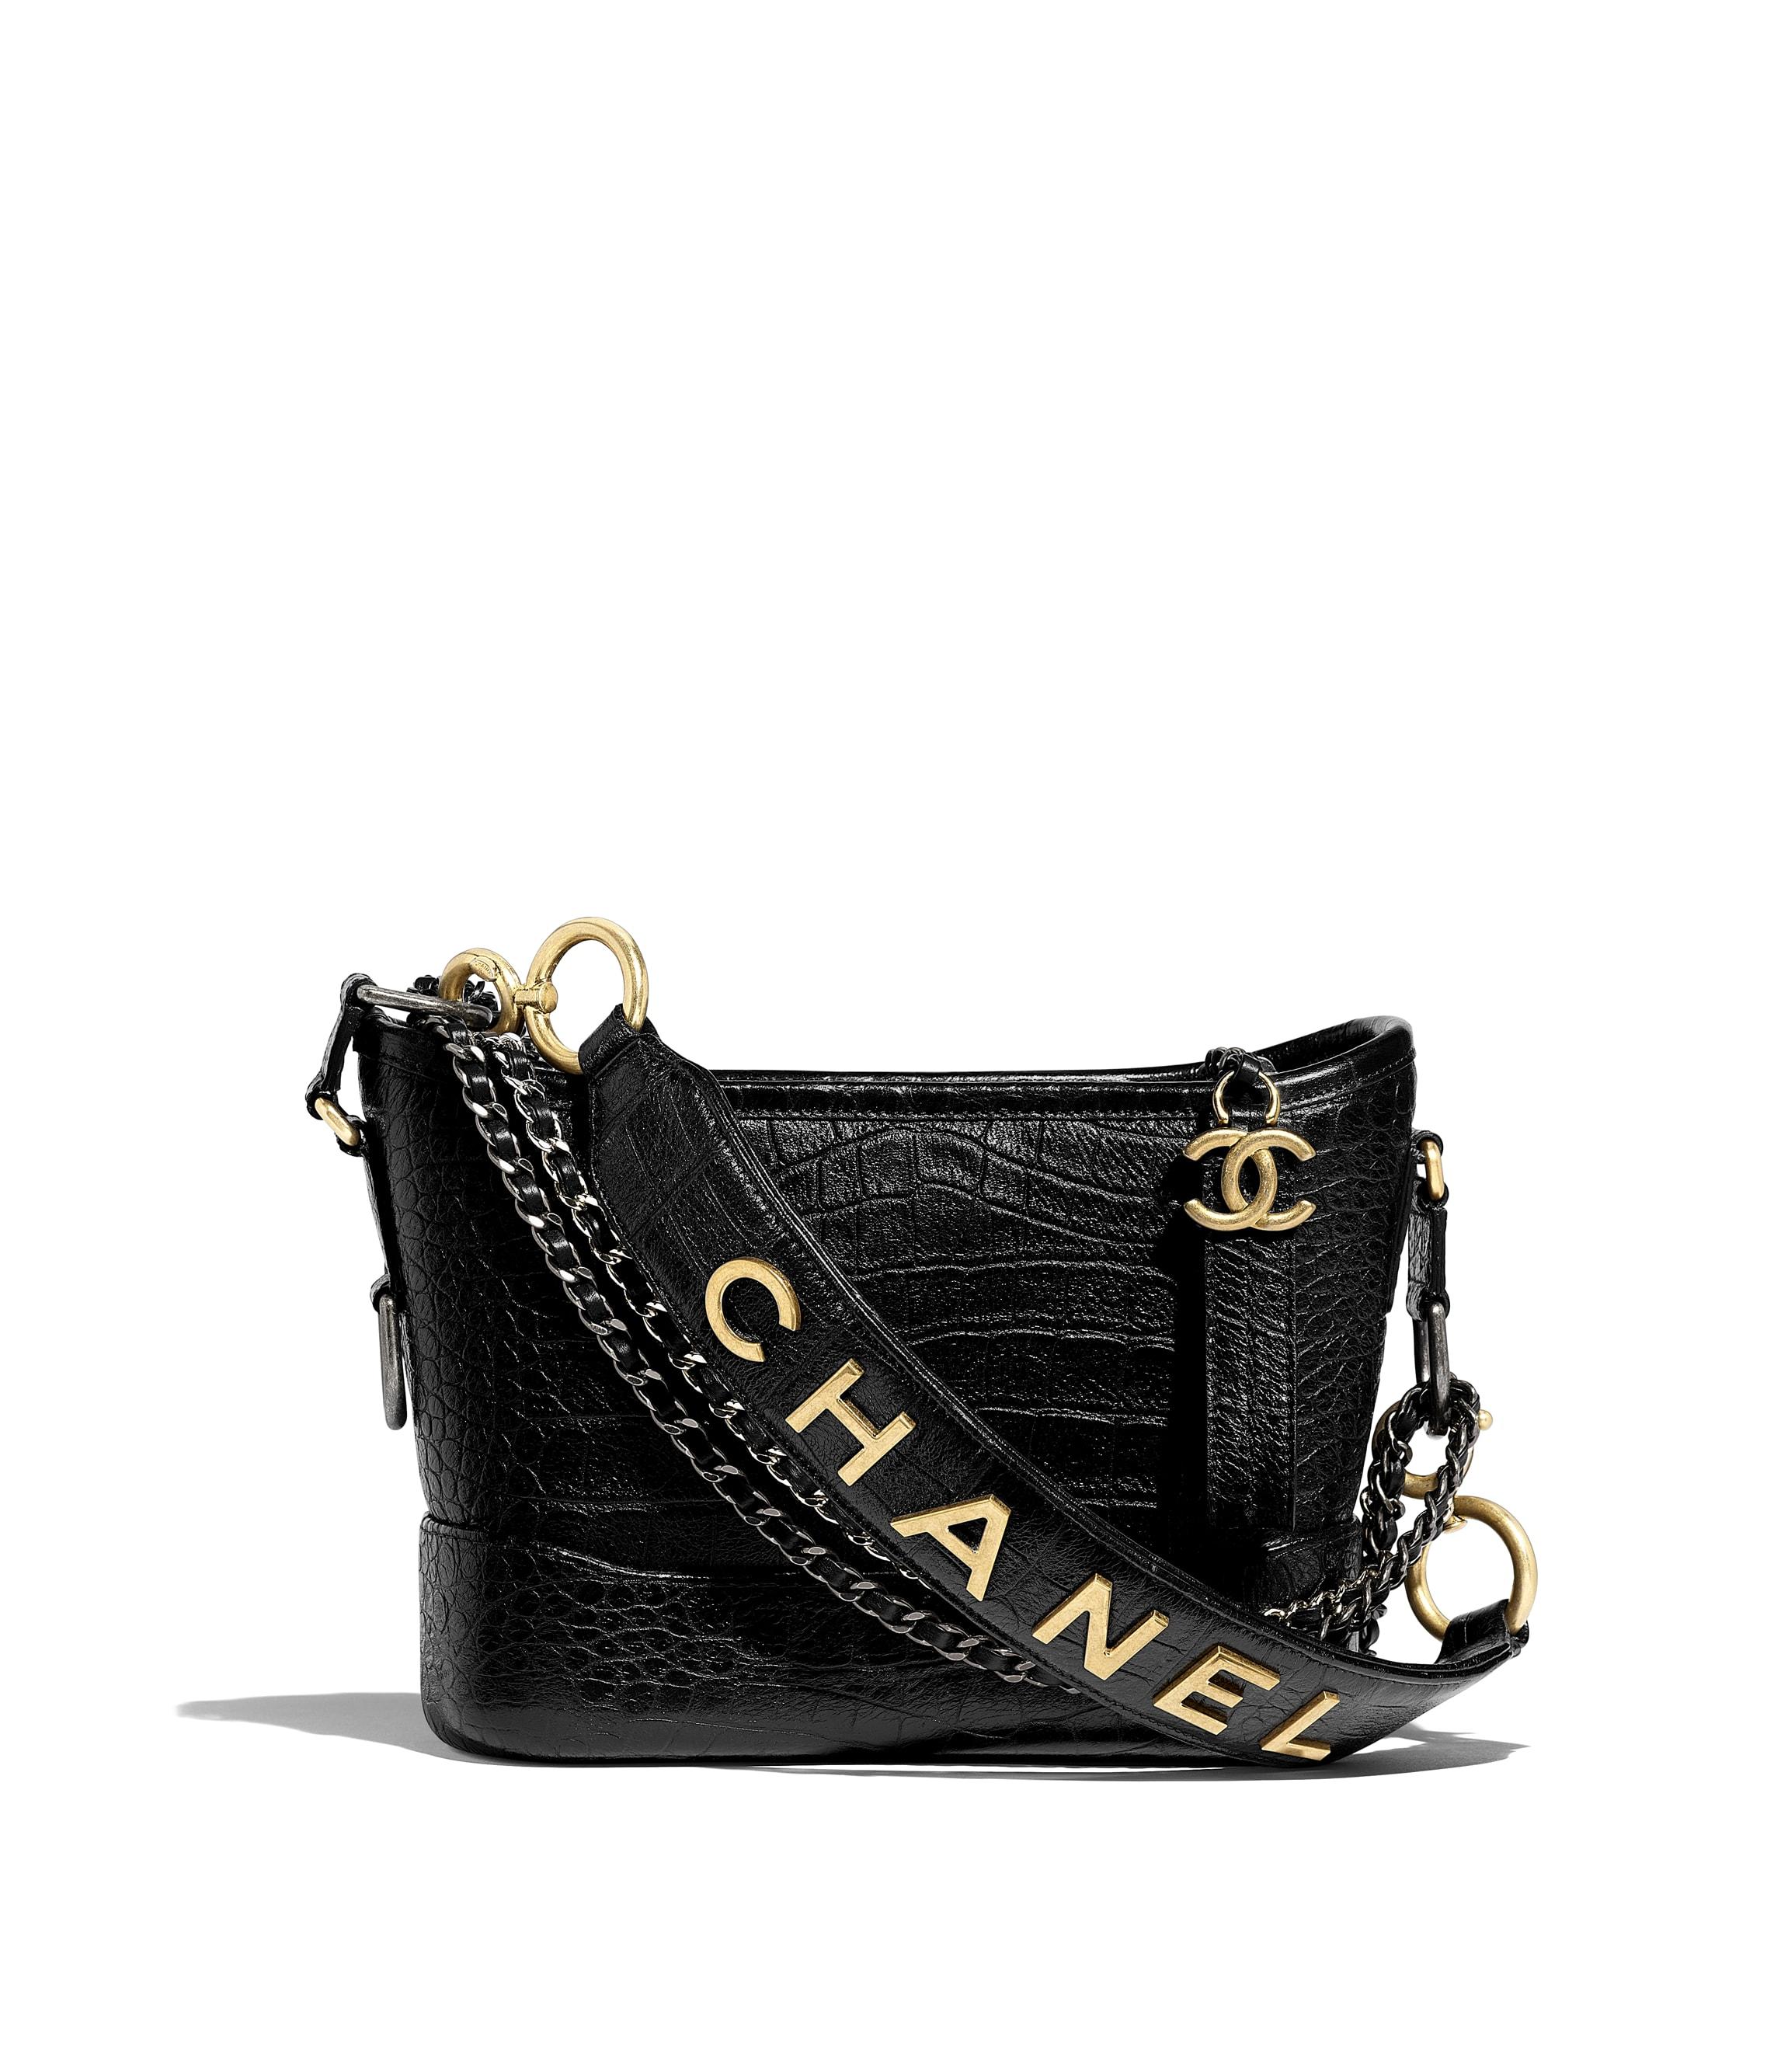 5d27e8f71590b4 CHANEL'S GABRIELLE Small Hobo Bag, crocodile embossed calfskin, gold ...